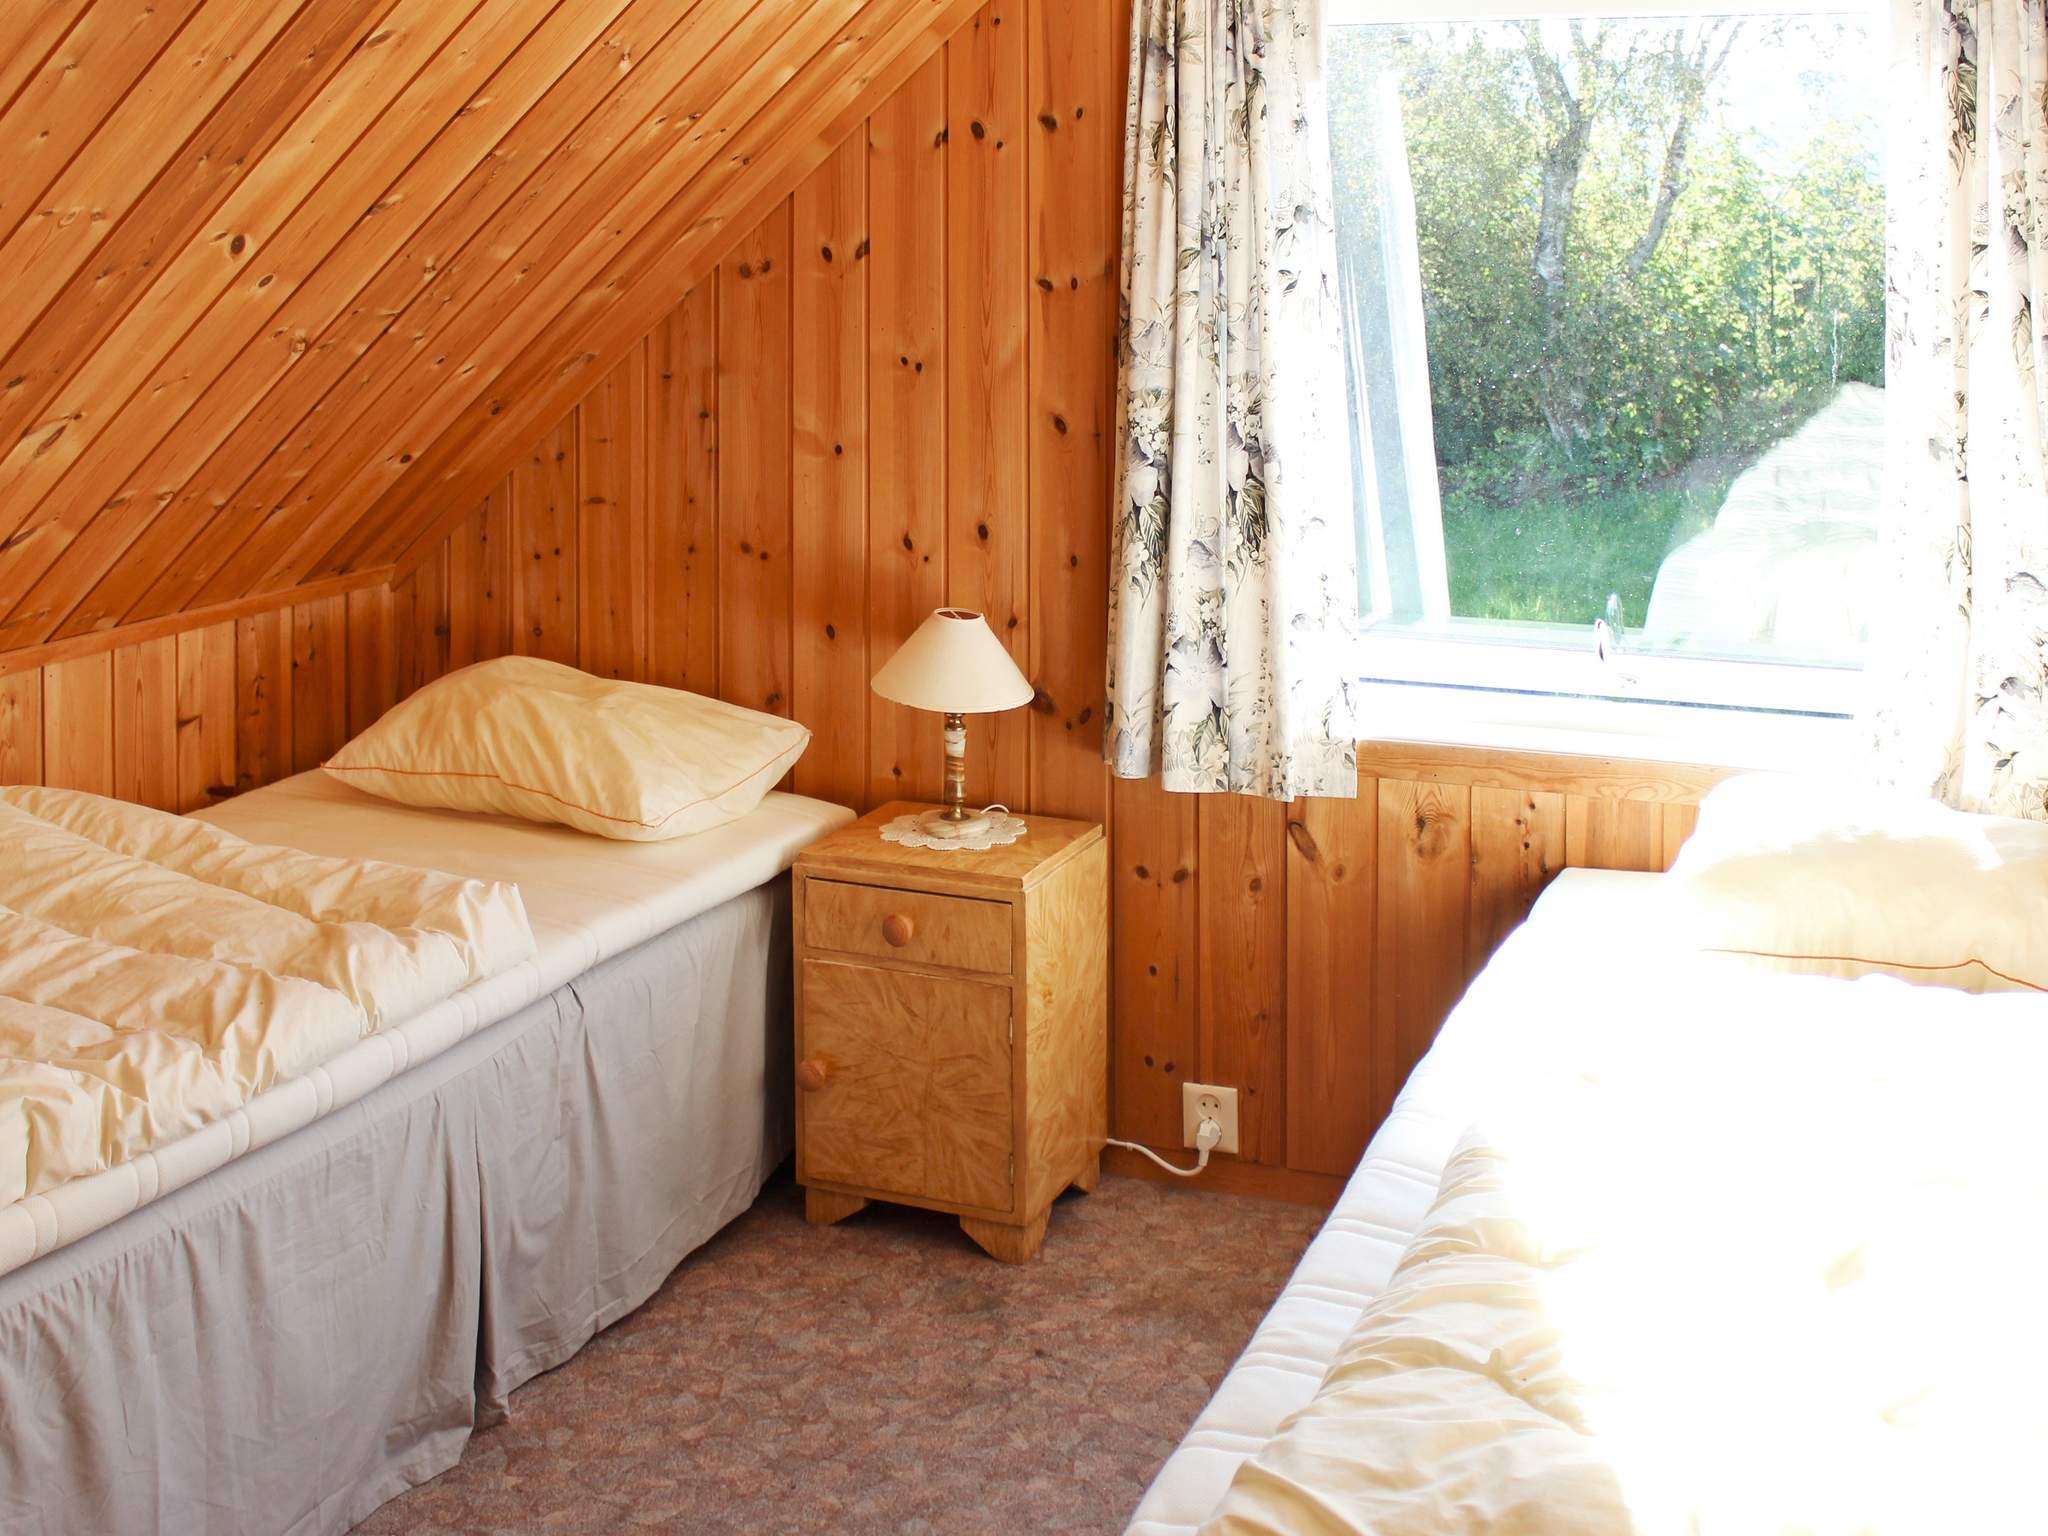 Ferienhaus Vevang (85080), Vevang, More - Romsdal, Westnorwegen, Norwegen, Bild 16